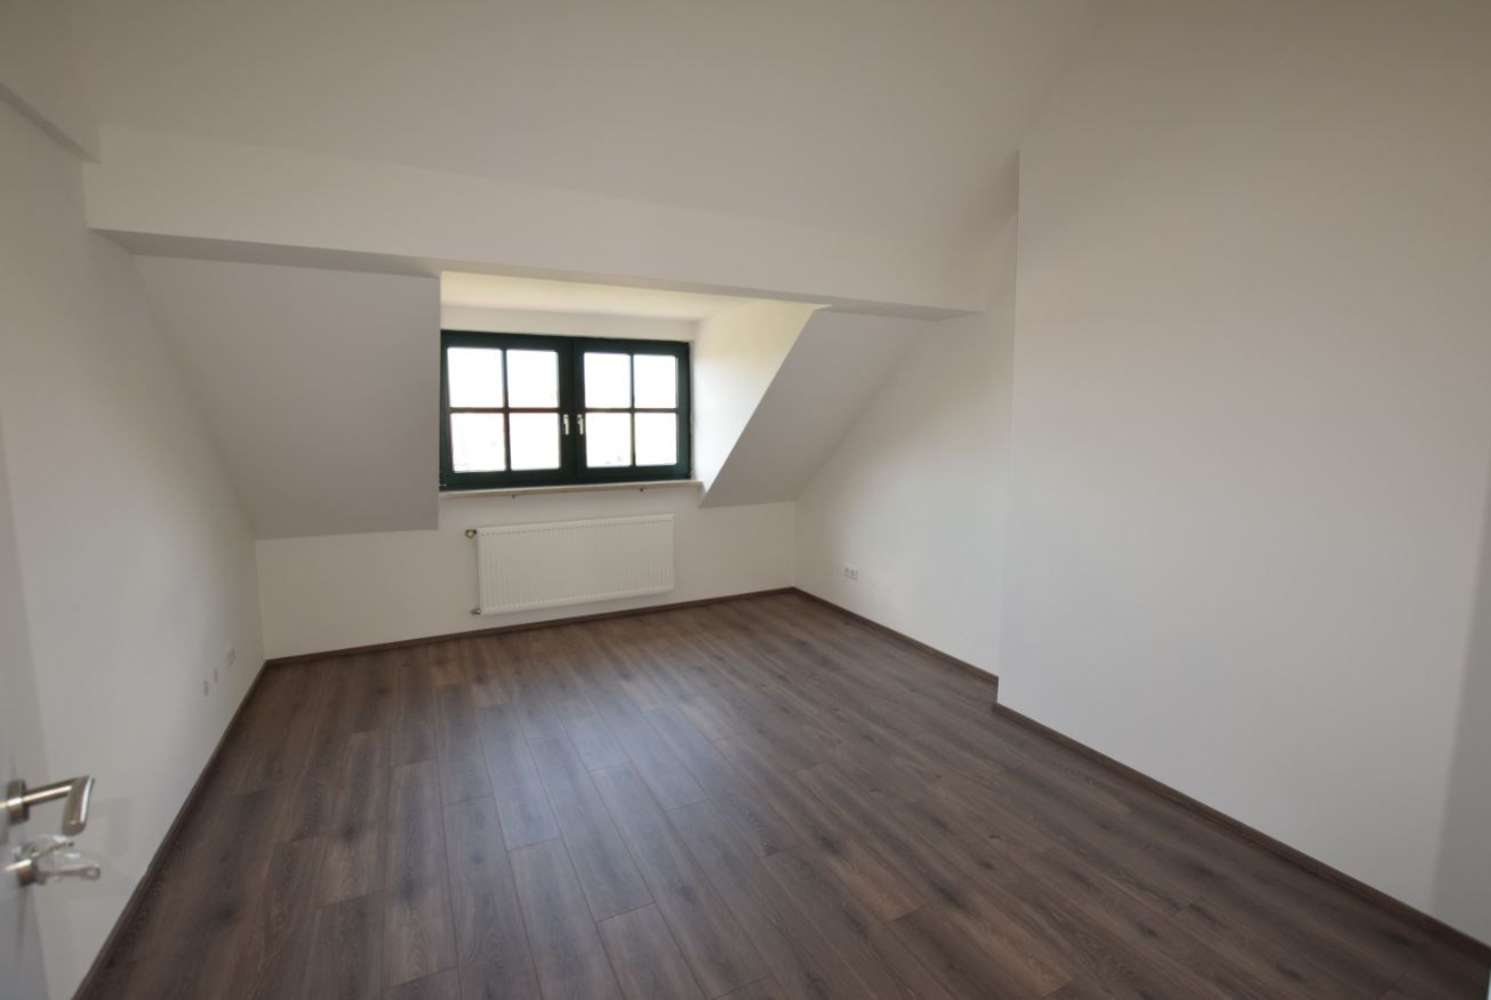 Büros Nürnberg, 90443 - Büro - Nürnberg, Tafelhof - M1018 - 10442969